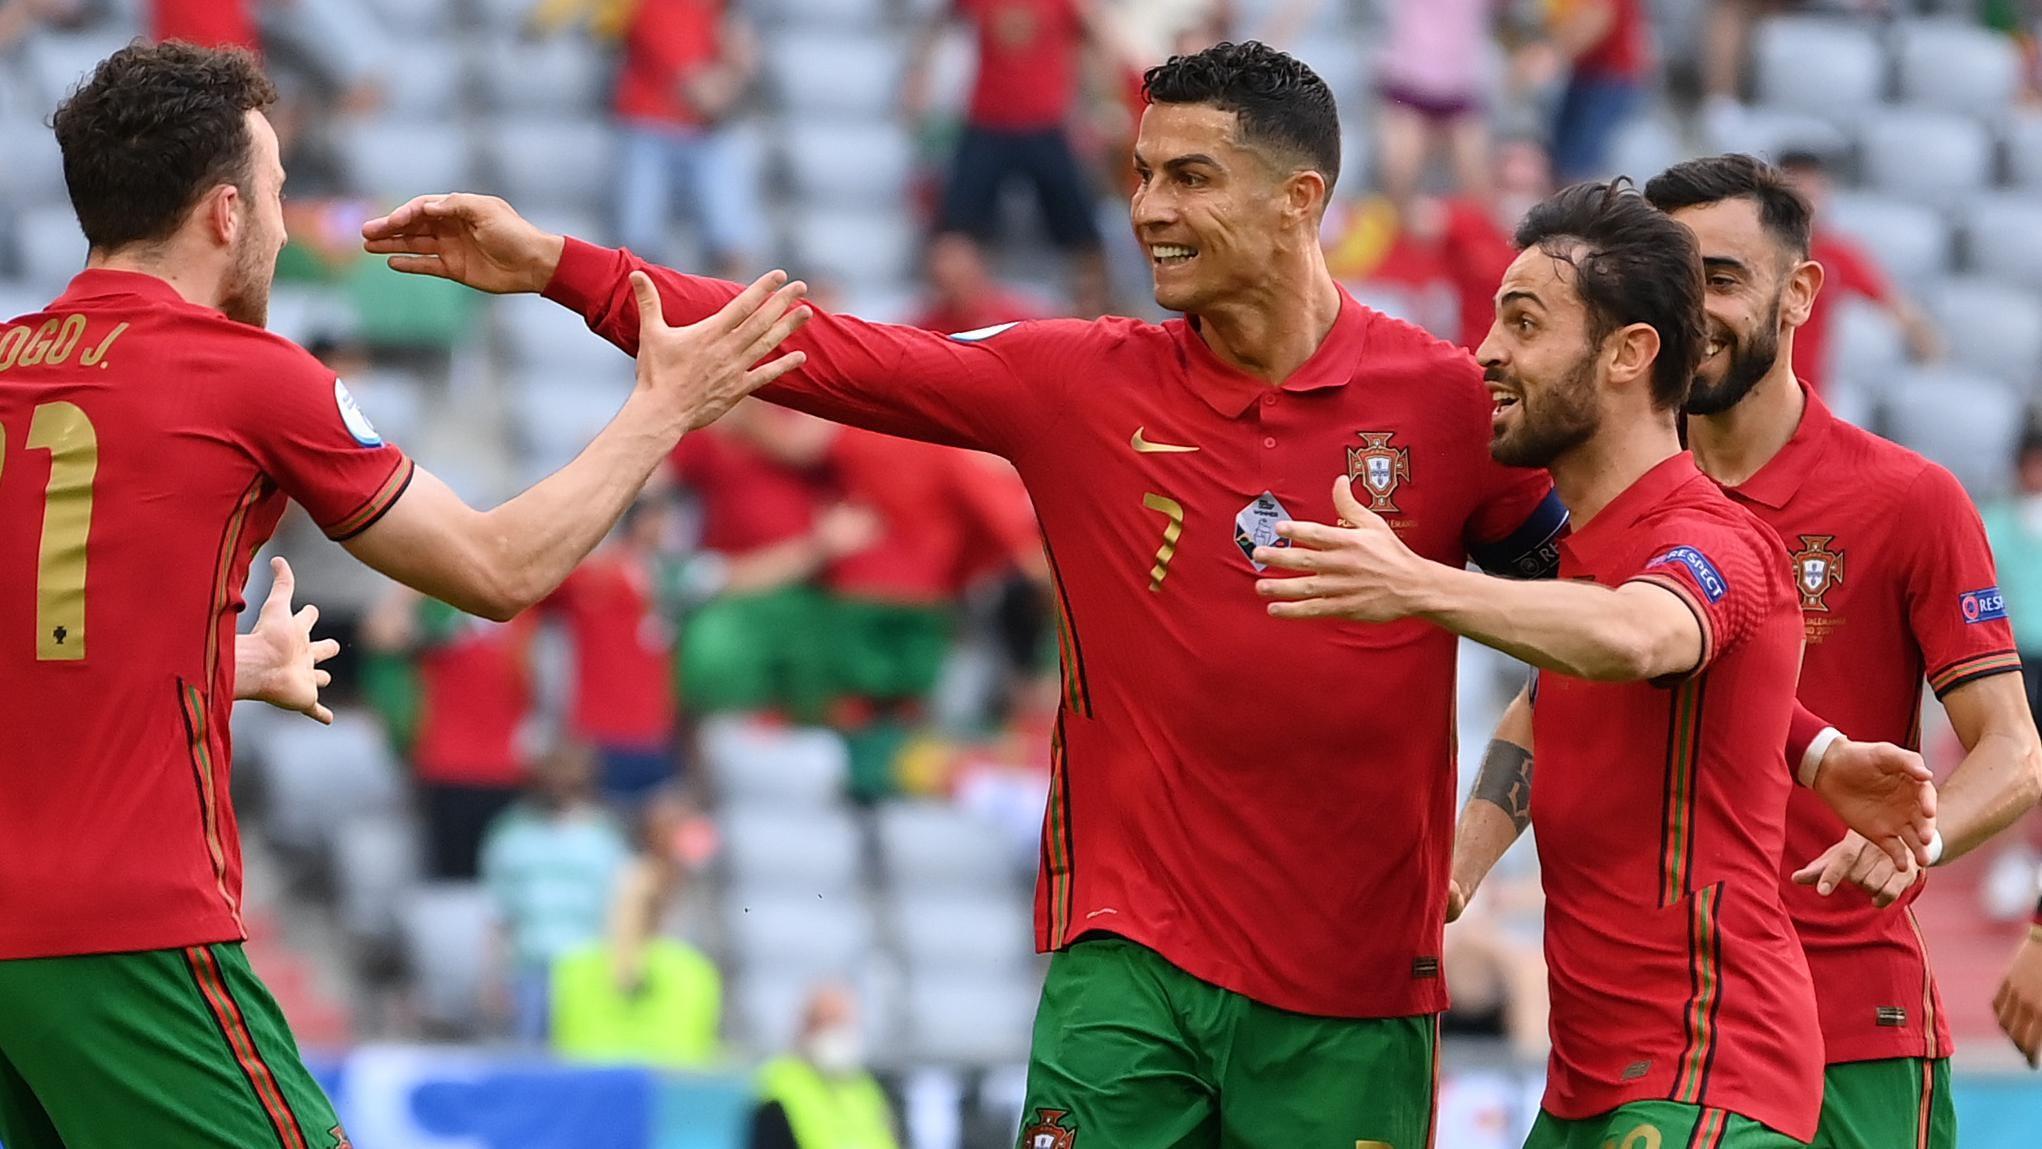 Cristiano Ronaldo adds to EURO all-time scoring record | UEFA EURO 2020 |  UEFA.com